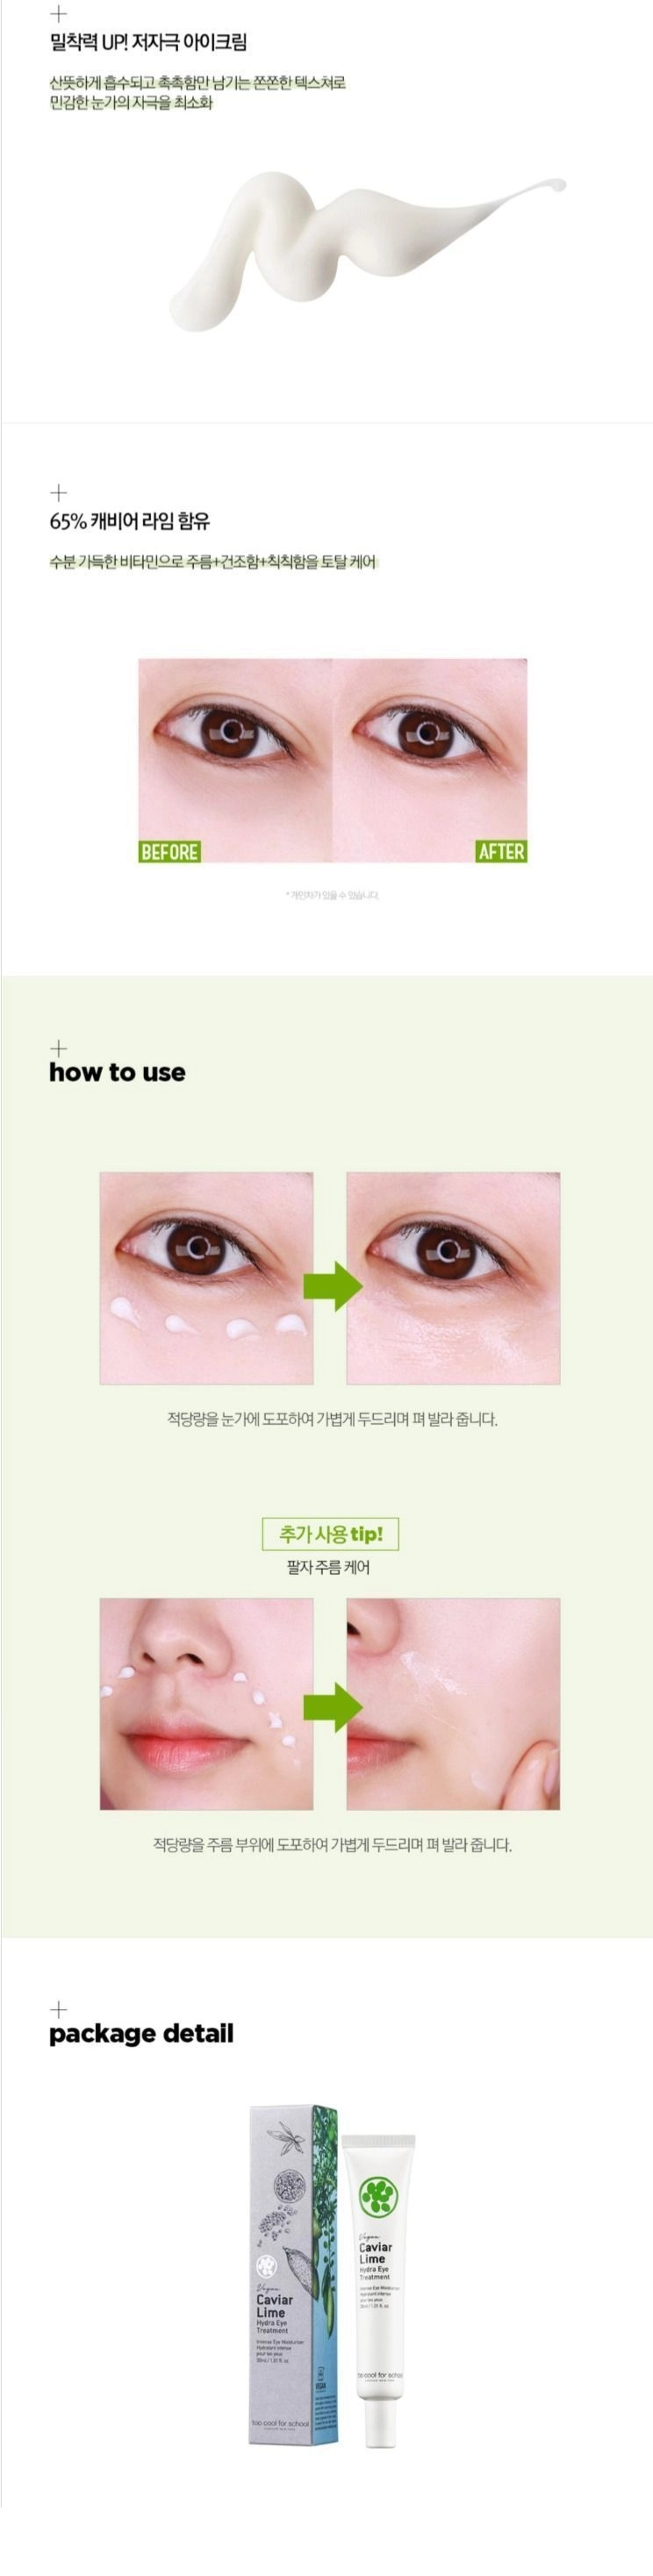 too cool for school Caviar Lime Hydra Eye Treatment korean skiancare product online shop malaysia singapore new zealand2